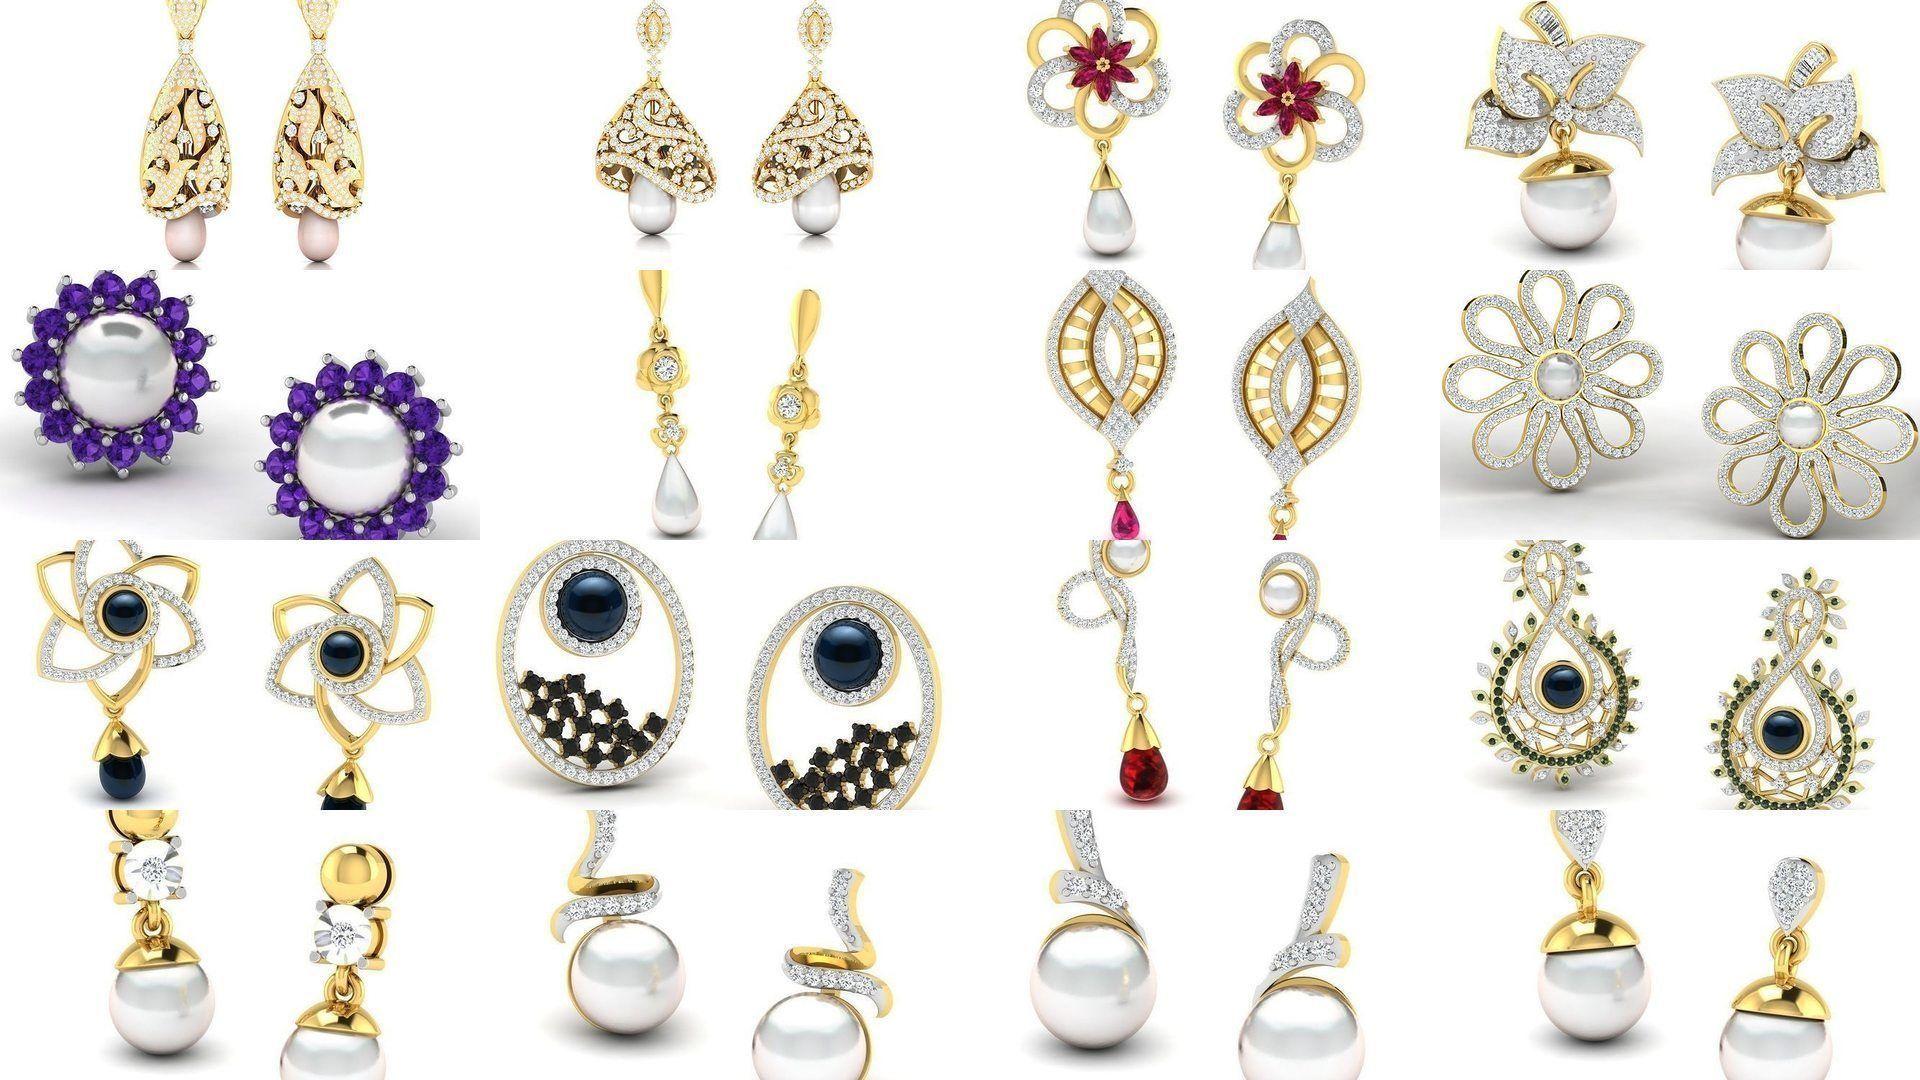 97 Women pearl earrings 3dm render detail